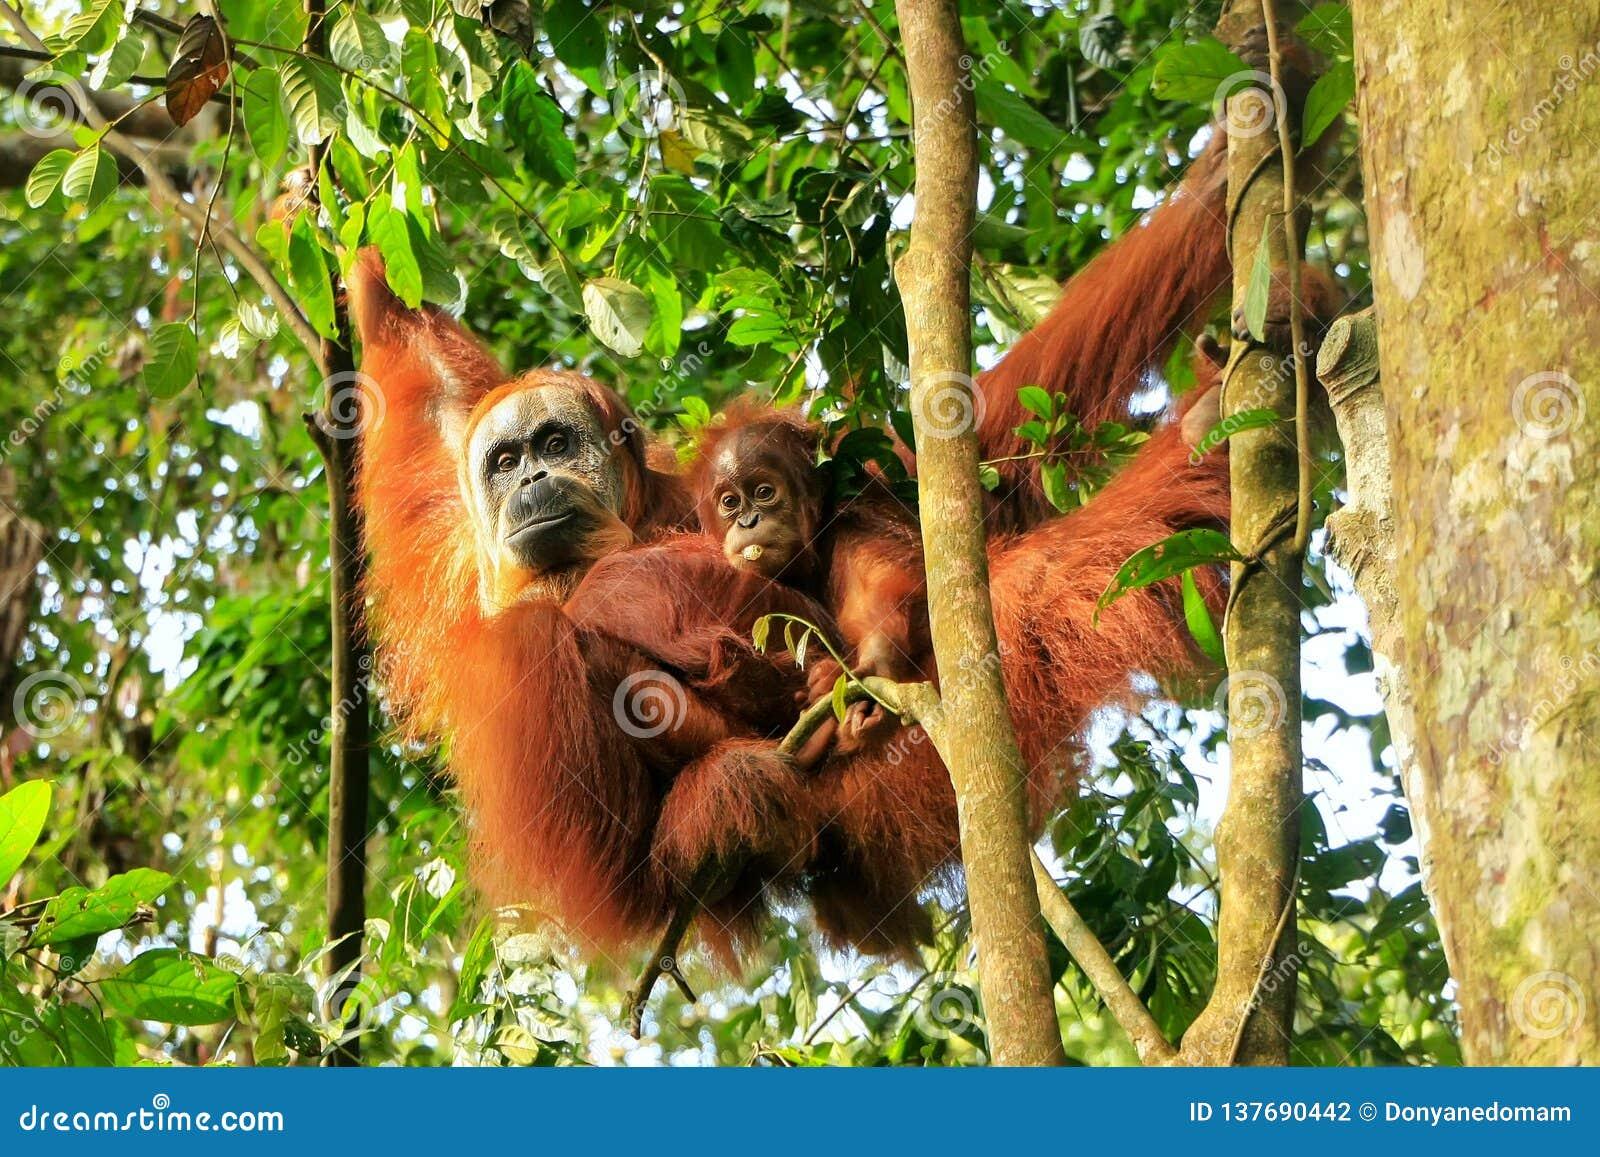 Close Up Of Orangutan In The Park Stock Photo - Image of